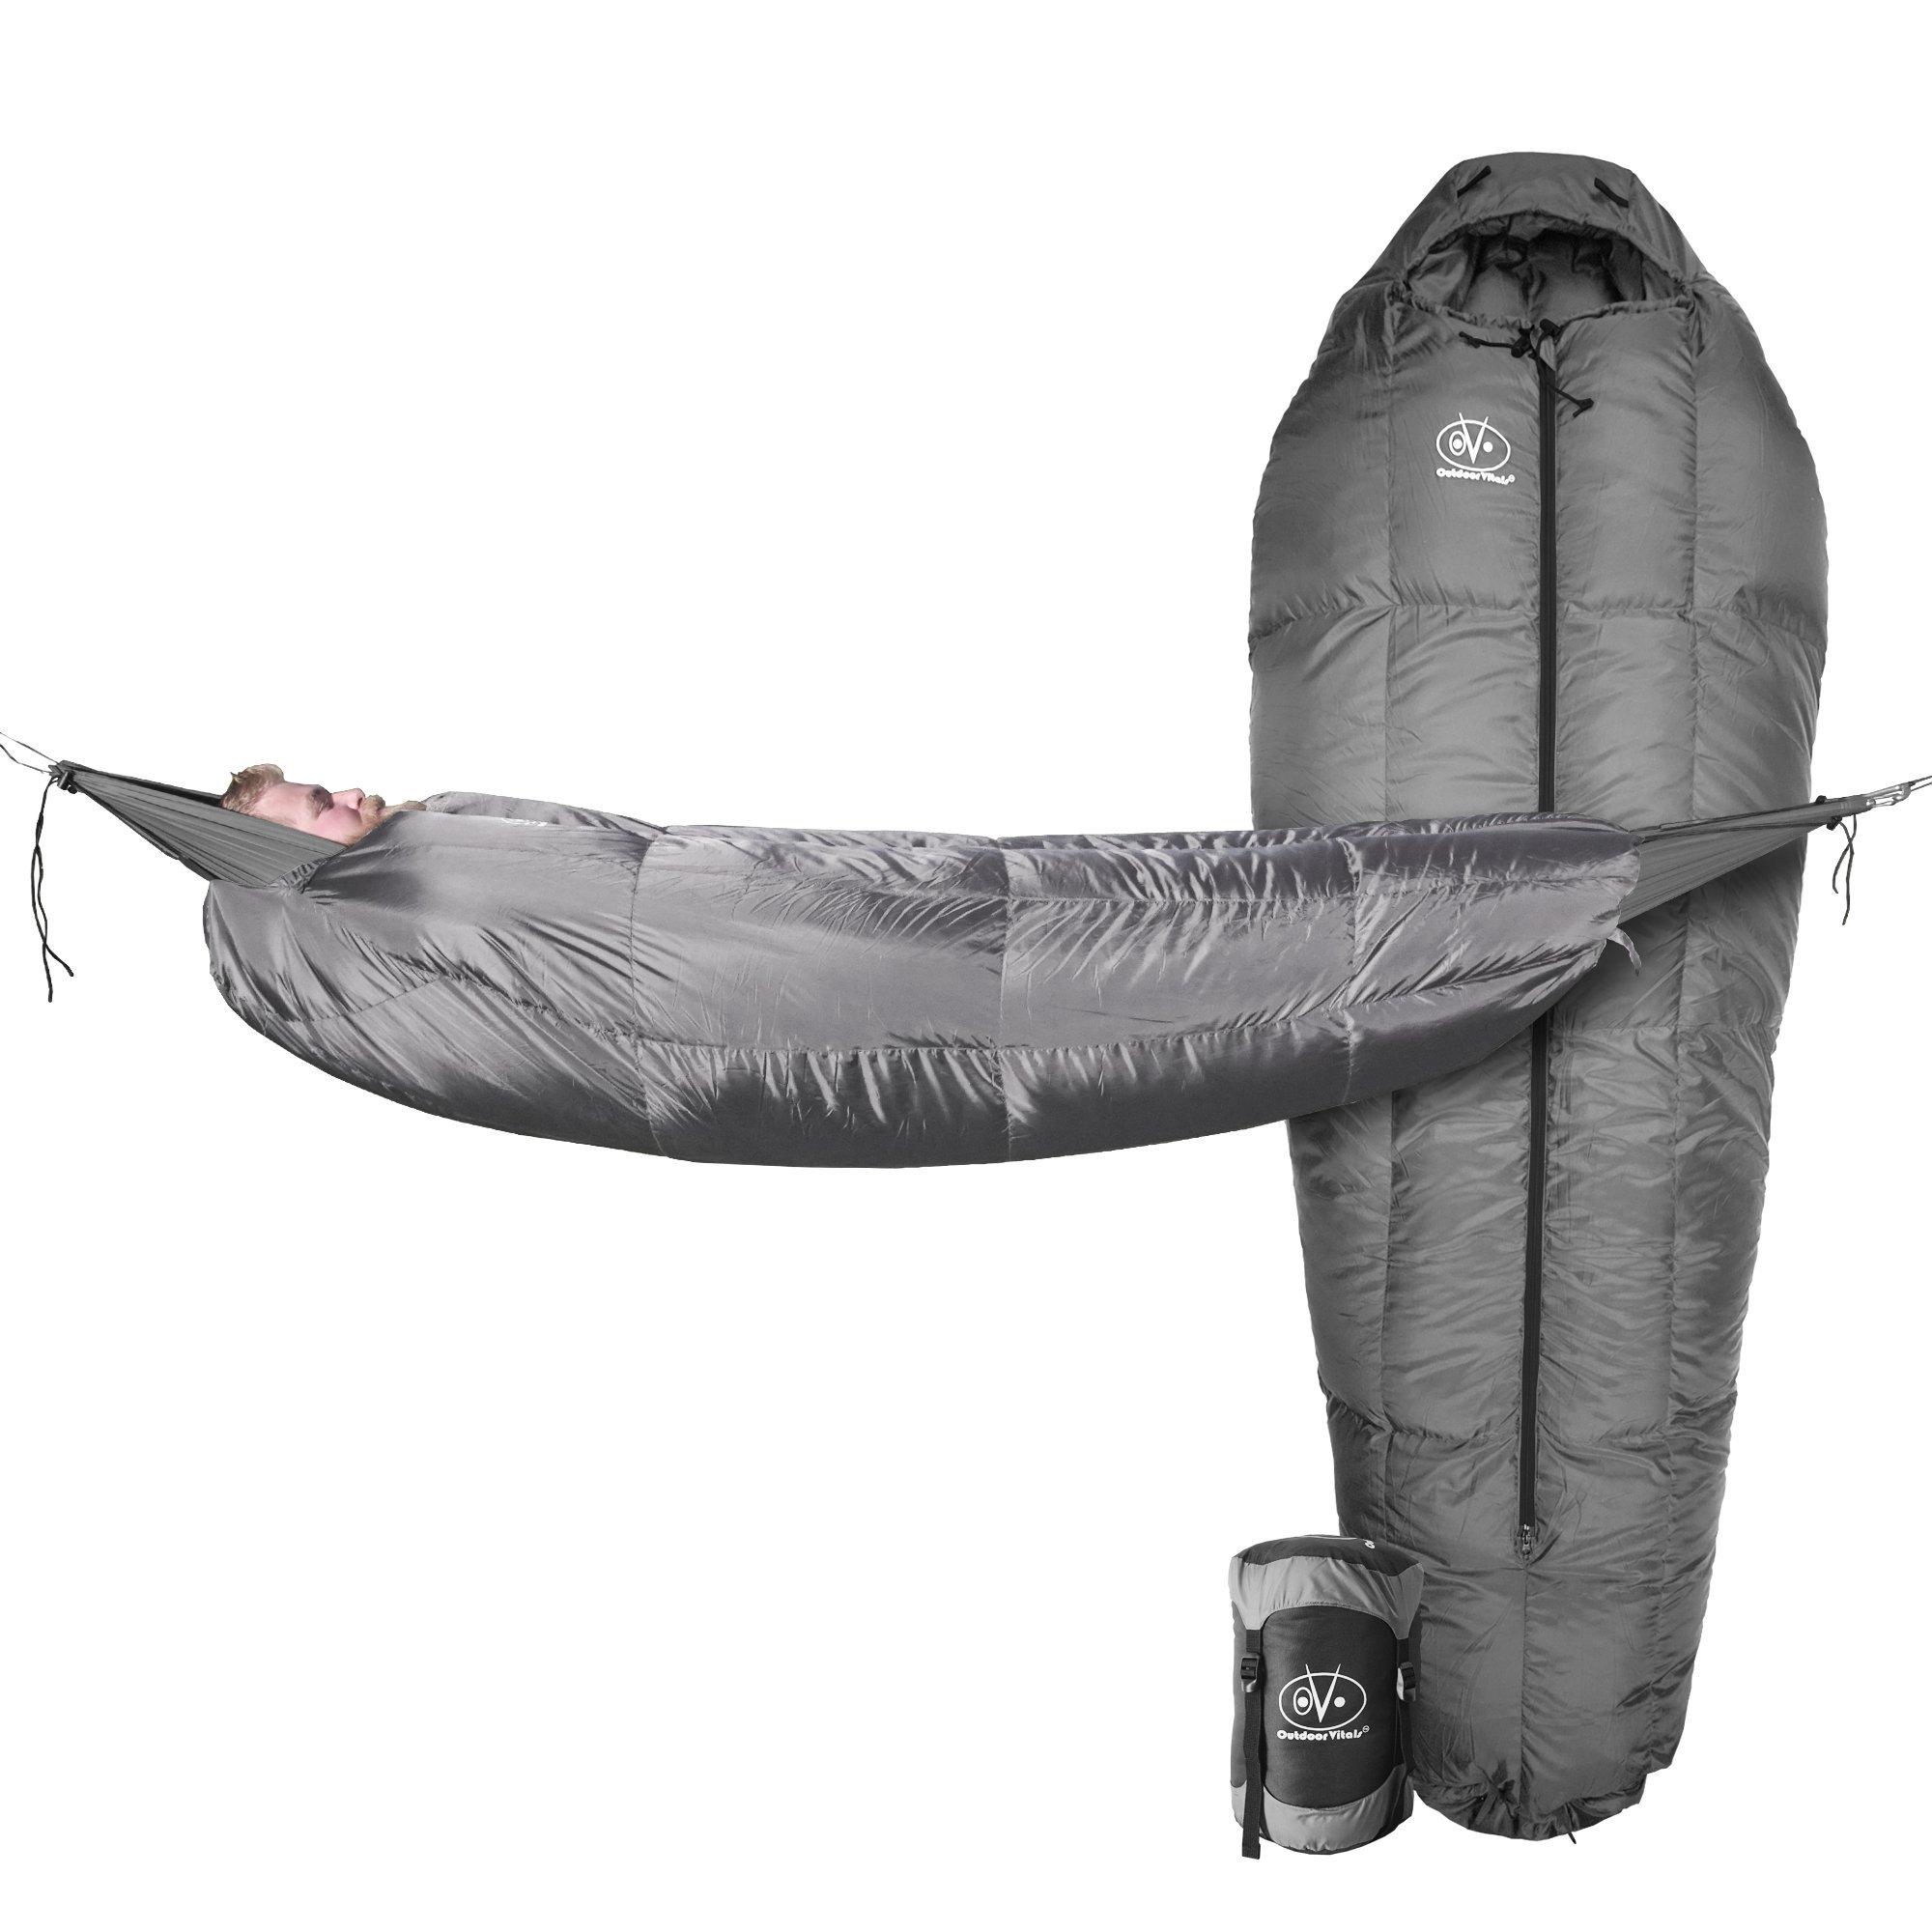 Outdoor Vitals StormLoft MummyPod Down Sleeping Bag for Hammock or Ground Camping